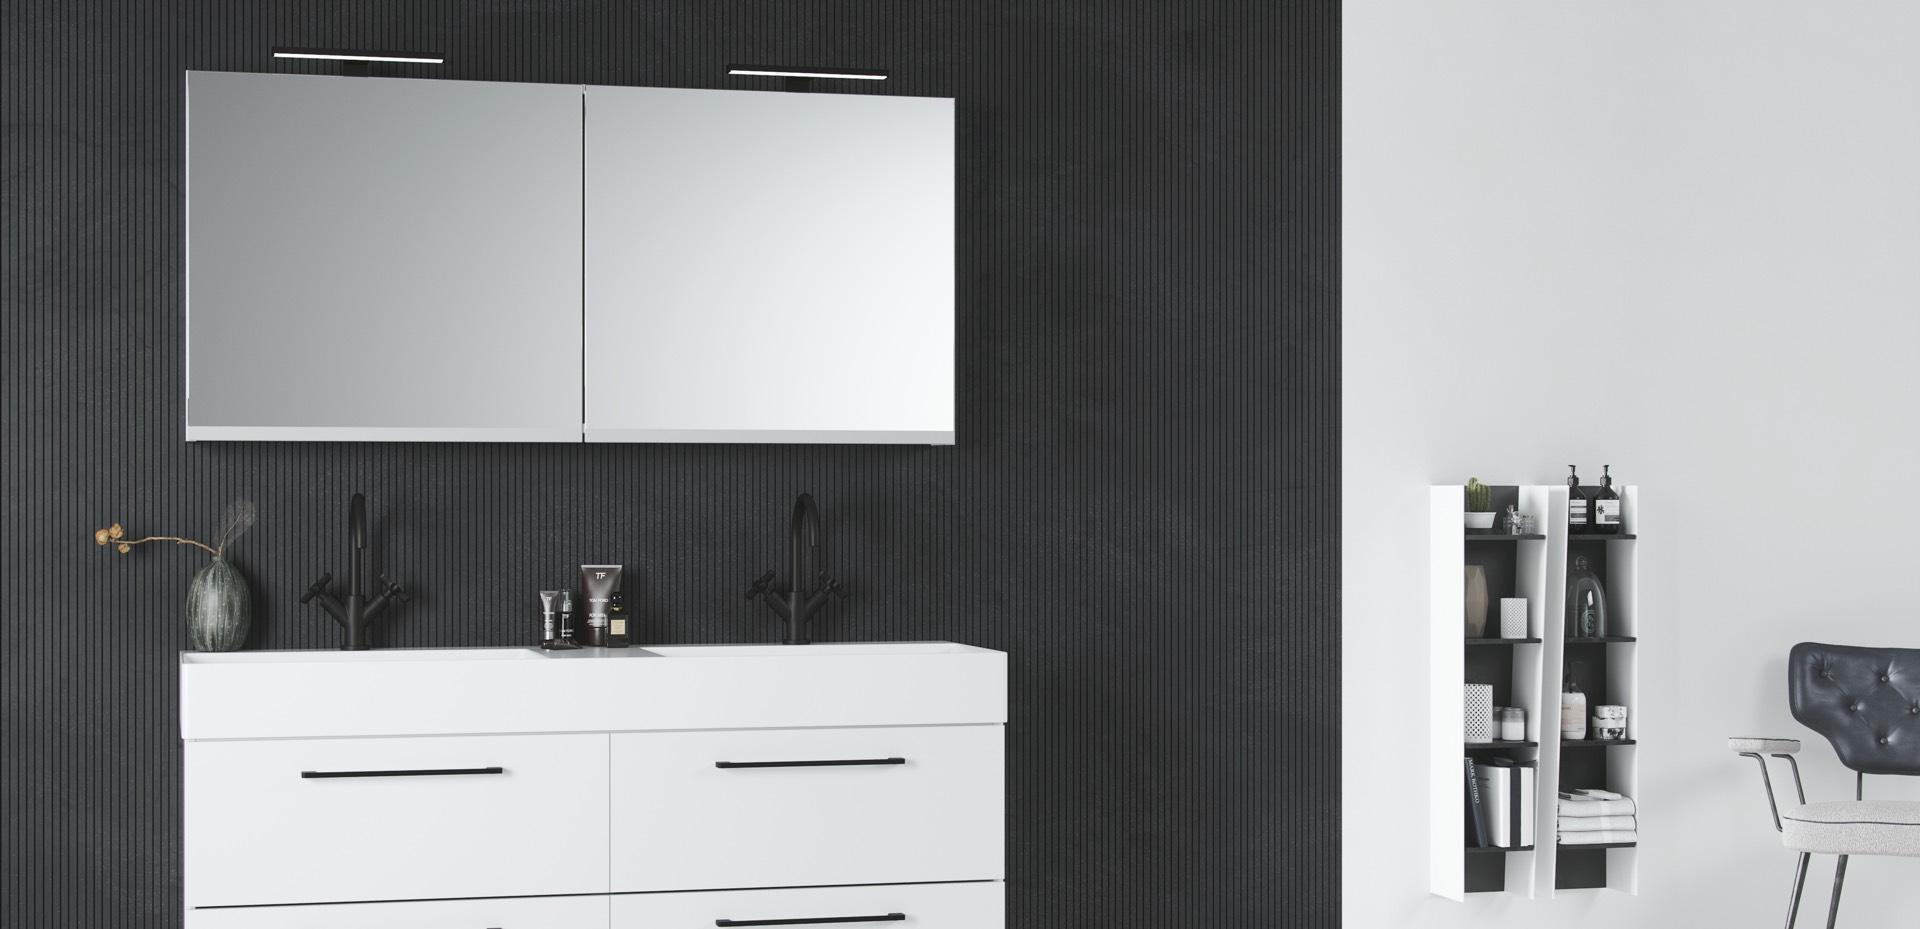 Blend-Keramiek-A85-mijn-bad-in-stijl